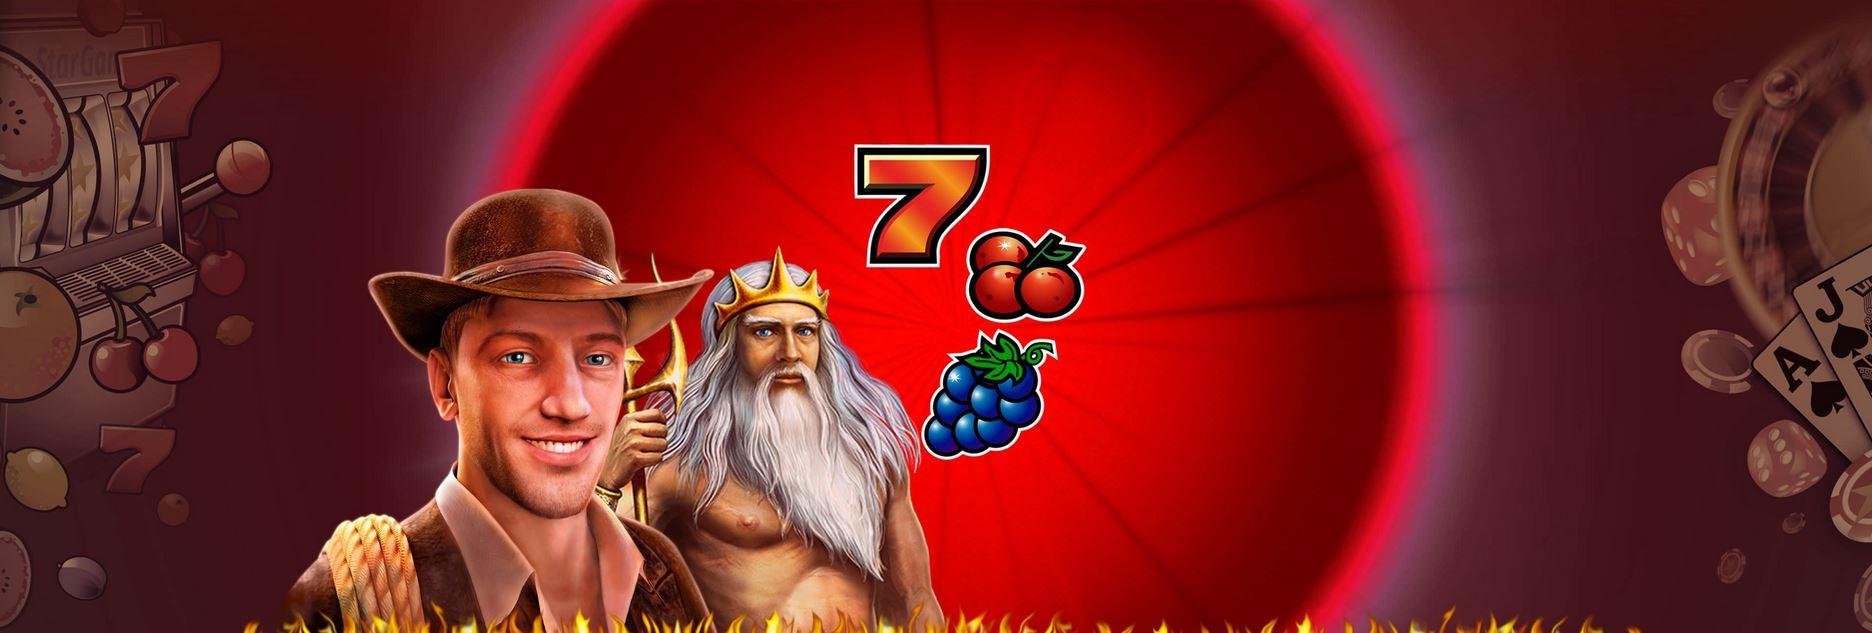 play casino online novo automaten